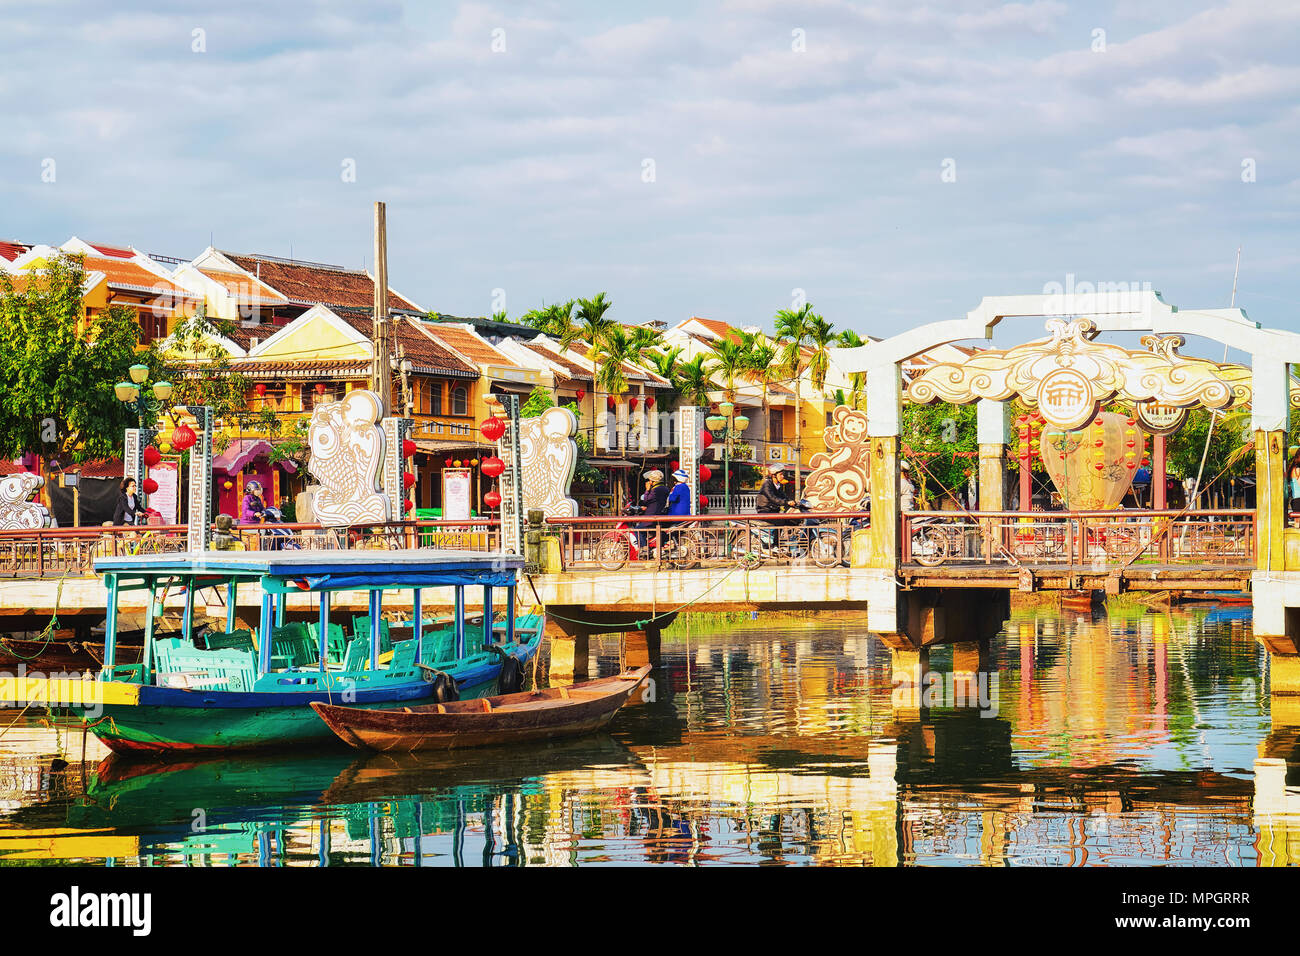 Hoi An, Vietnam - February 17, 2016: Boat at the Embankment of Thu Bon River, Hoi An, Vietnam Stock Photo